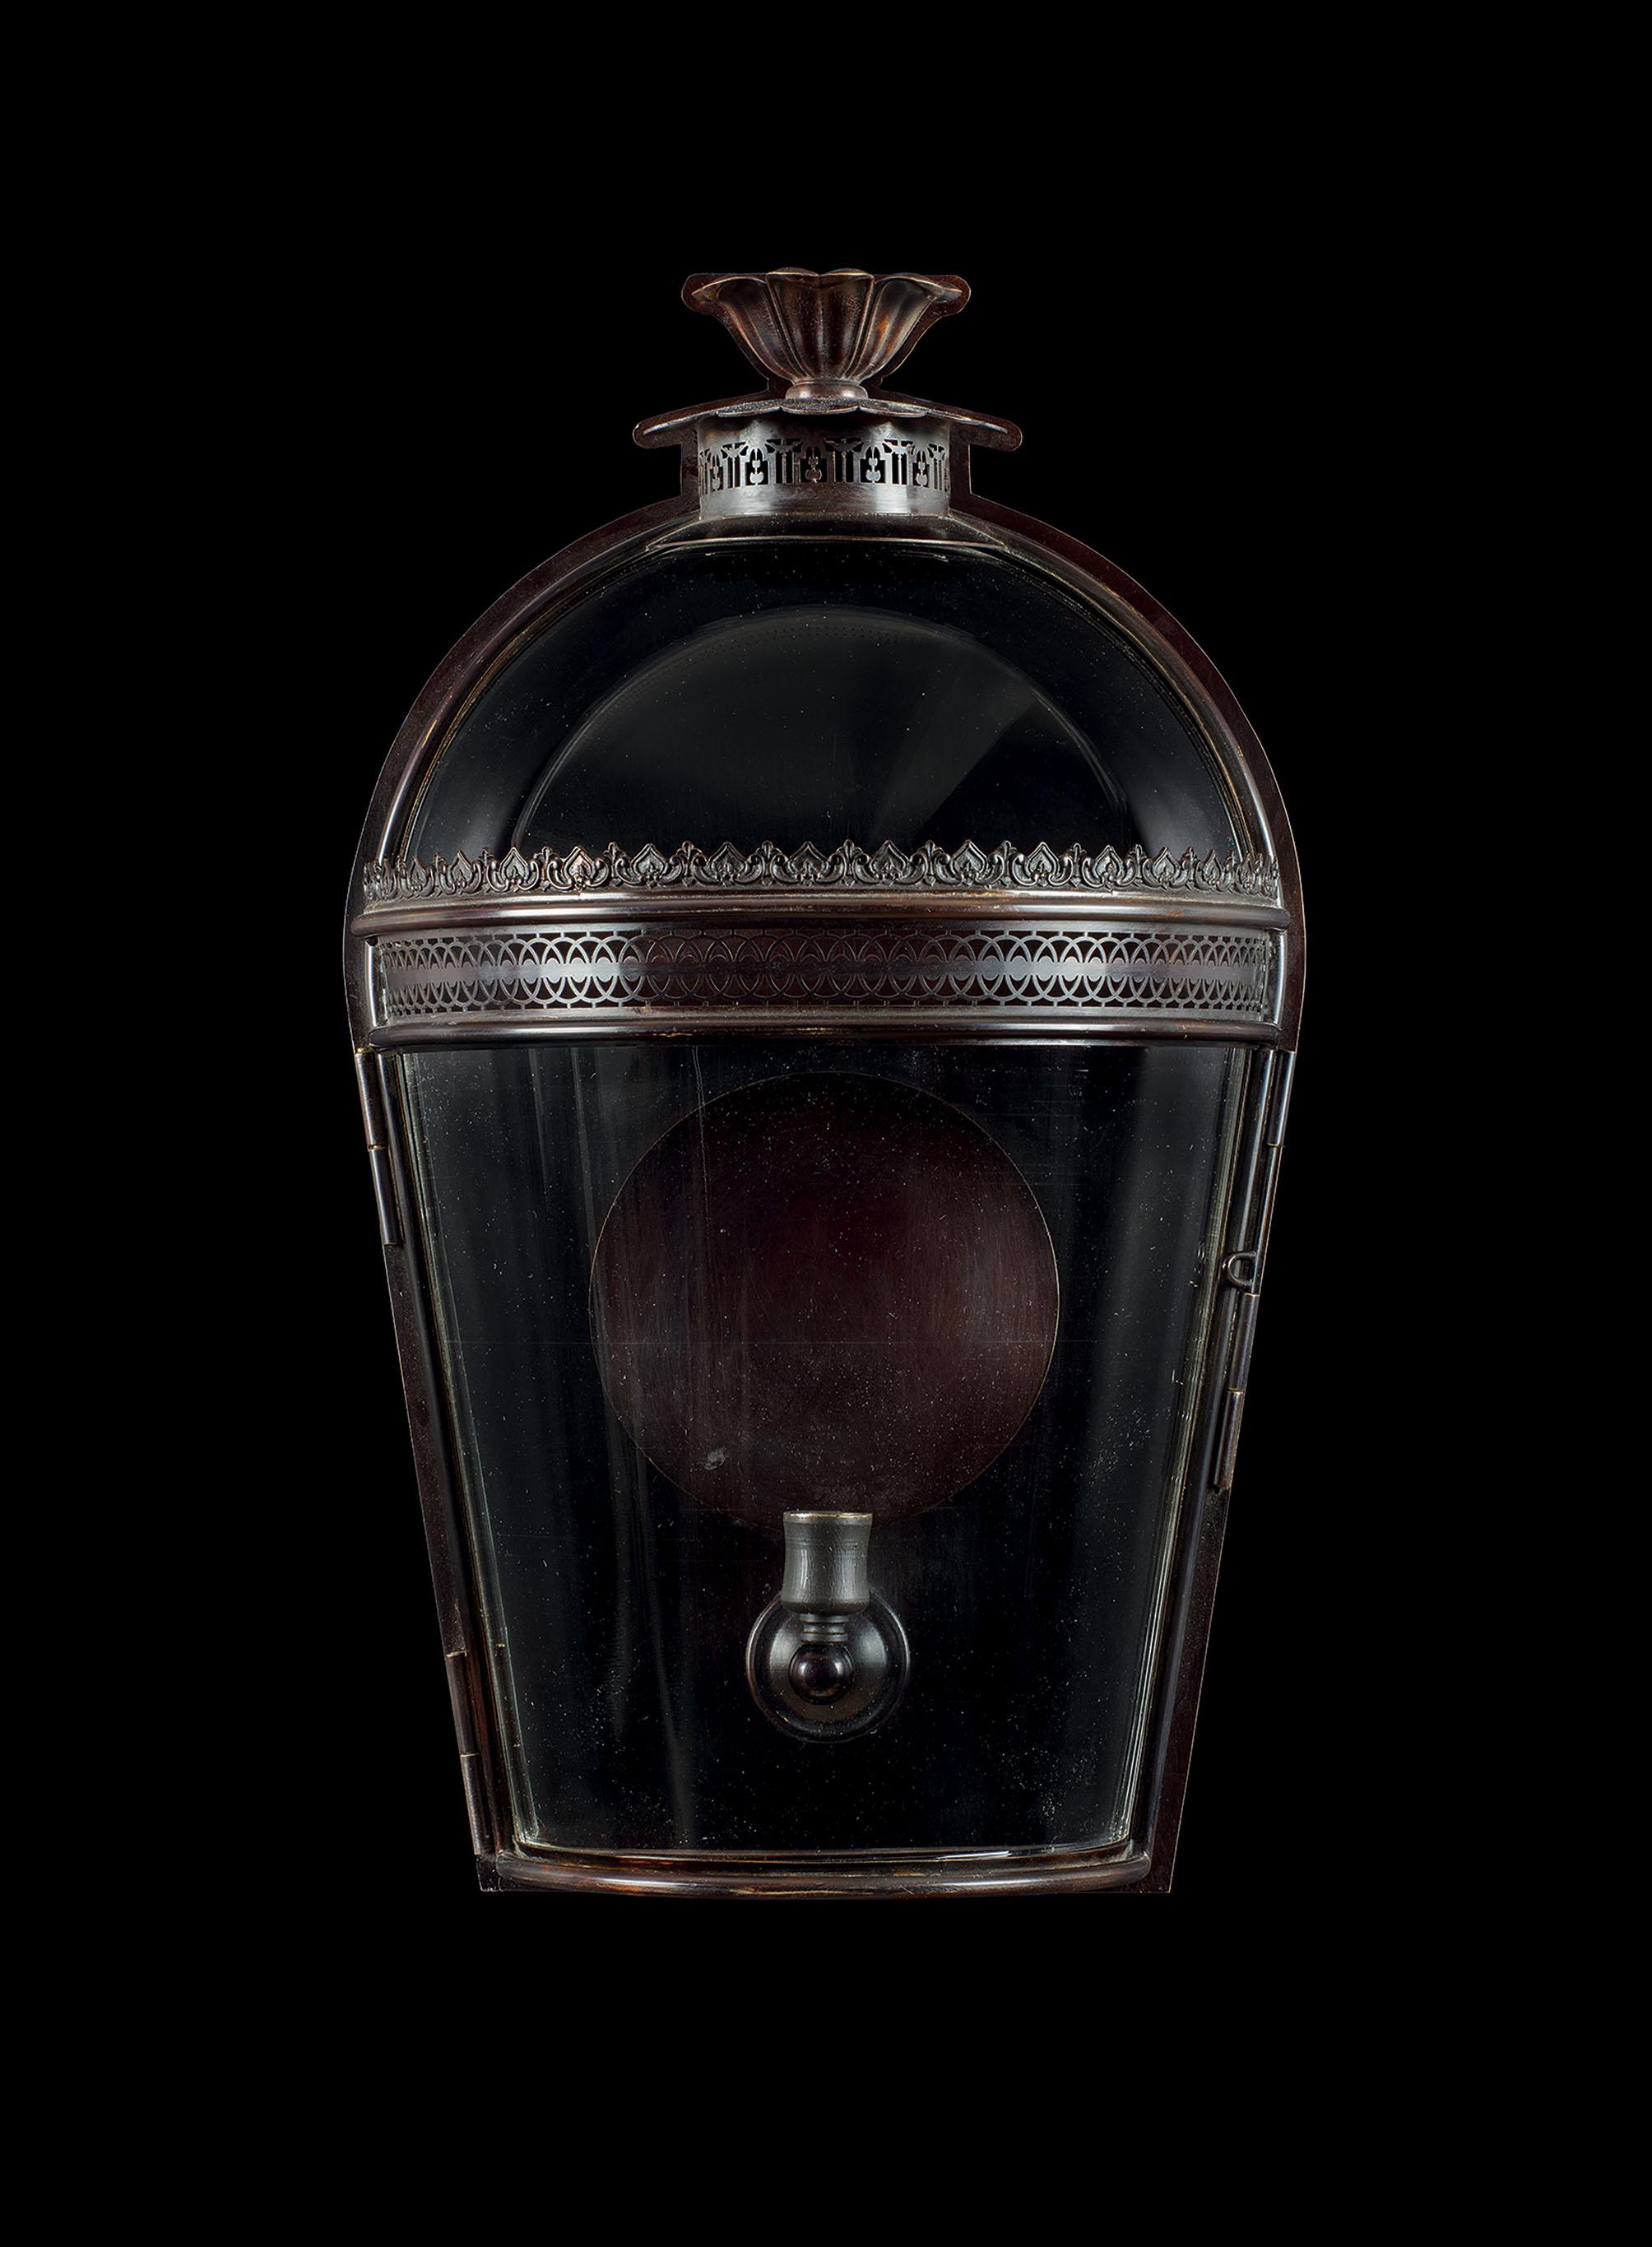 Reproduction Antique Lighting Hanging Lanterns Amp Wall Lights Jamb